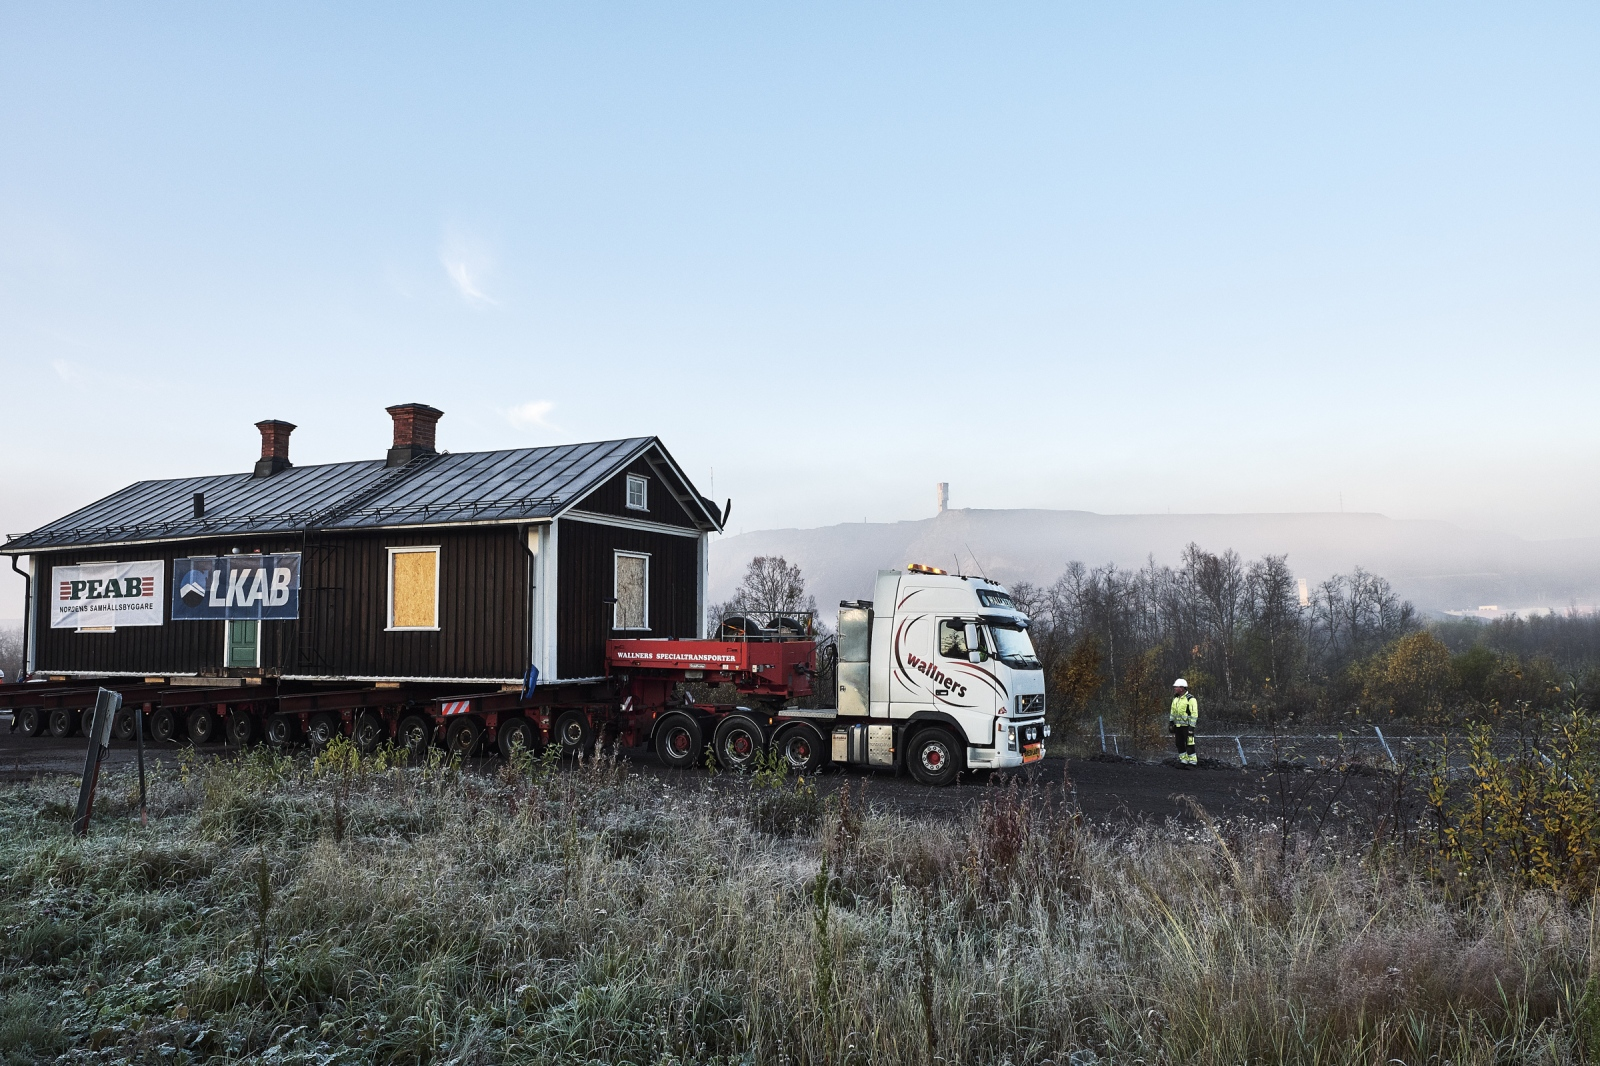 Photography image - Loading Kiruna_17-09-27_7397_8Bit_2400px.jpg